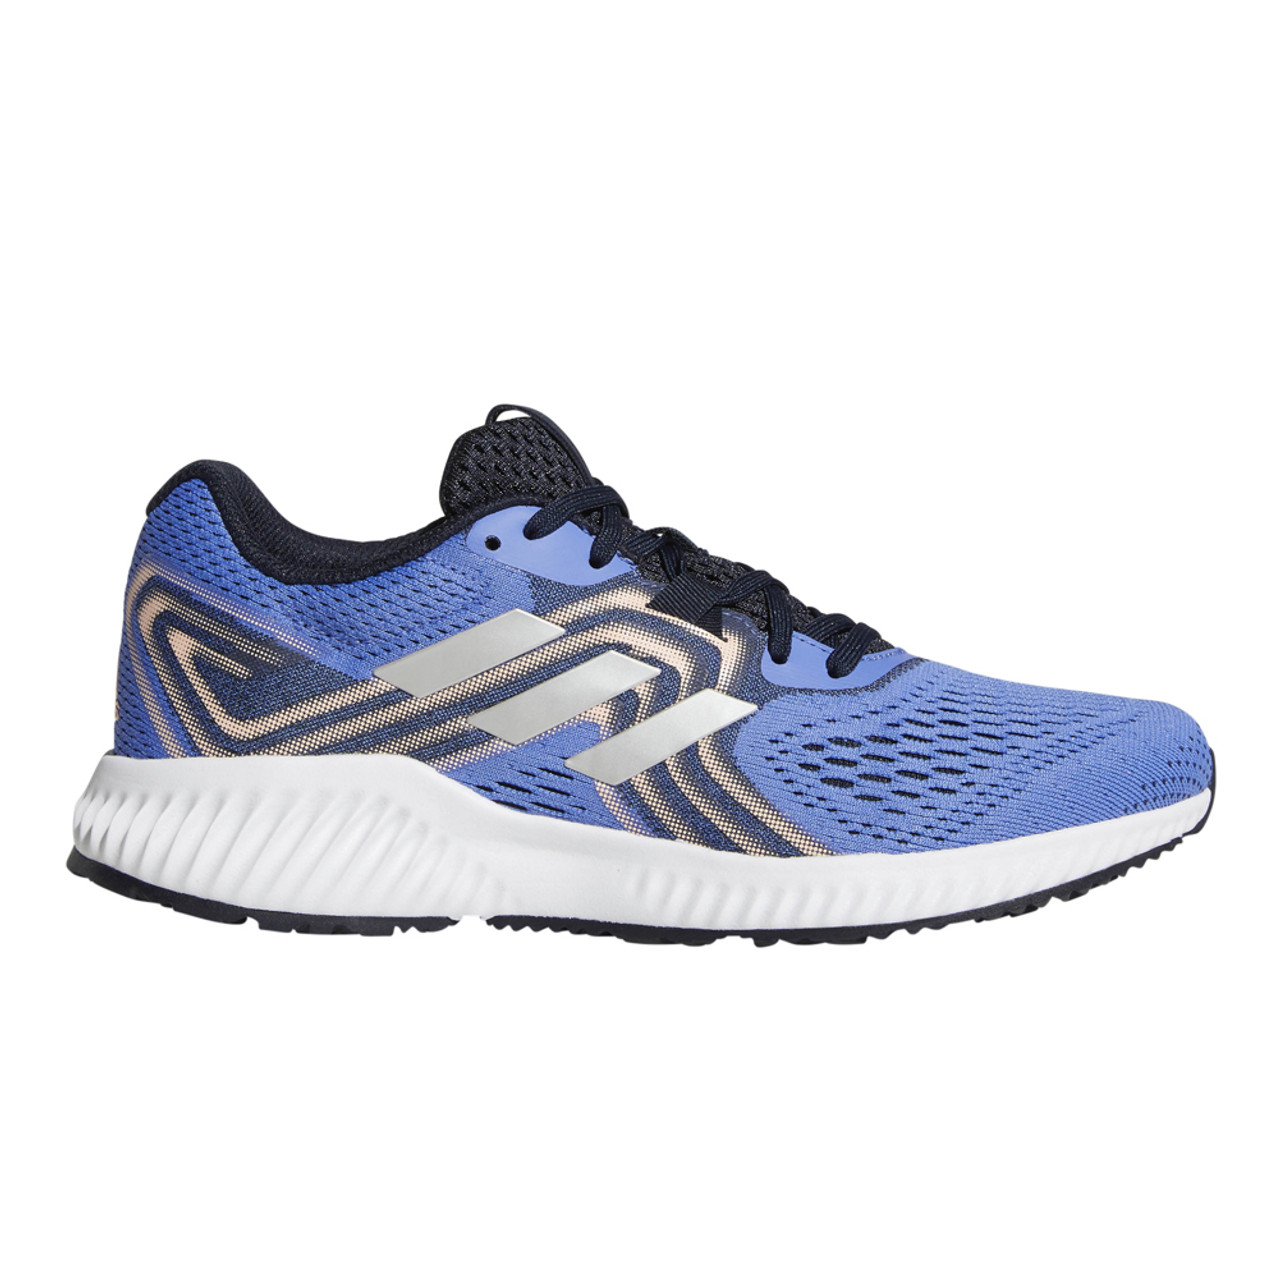 san francisco 123b3 1181f Adidas Womens Aerobounce 2 Running Shoe LilacOrange - Shop now   Shoolu.com